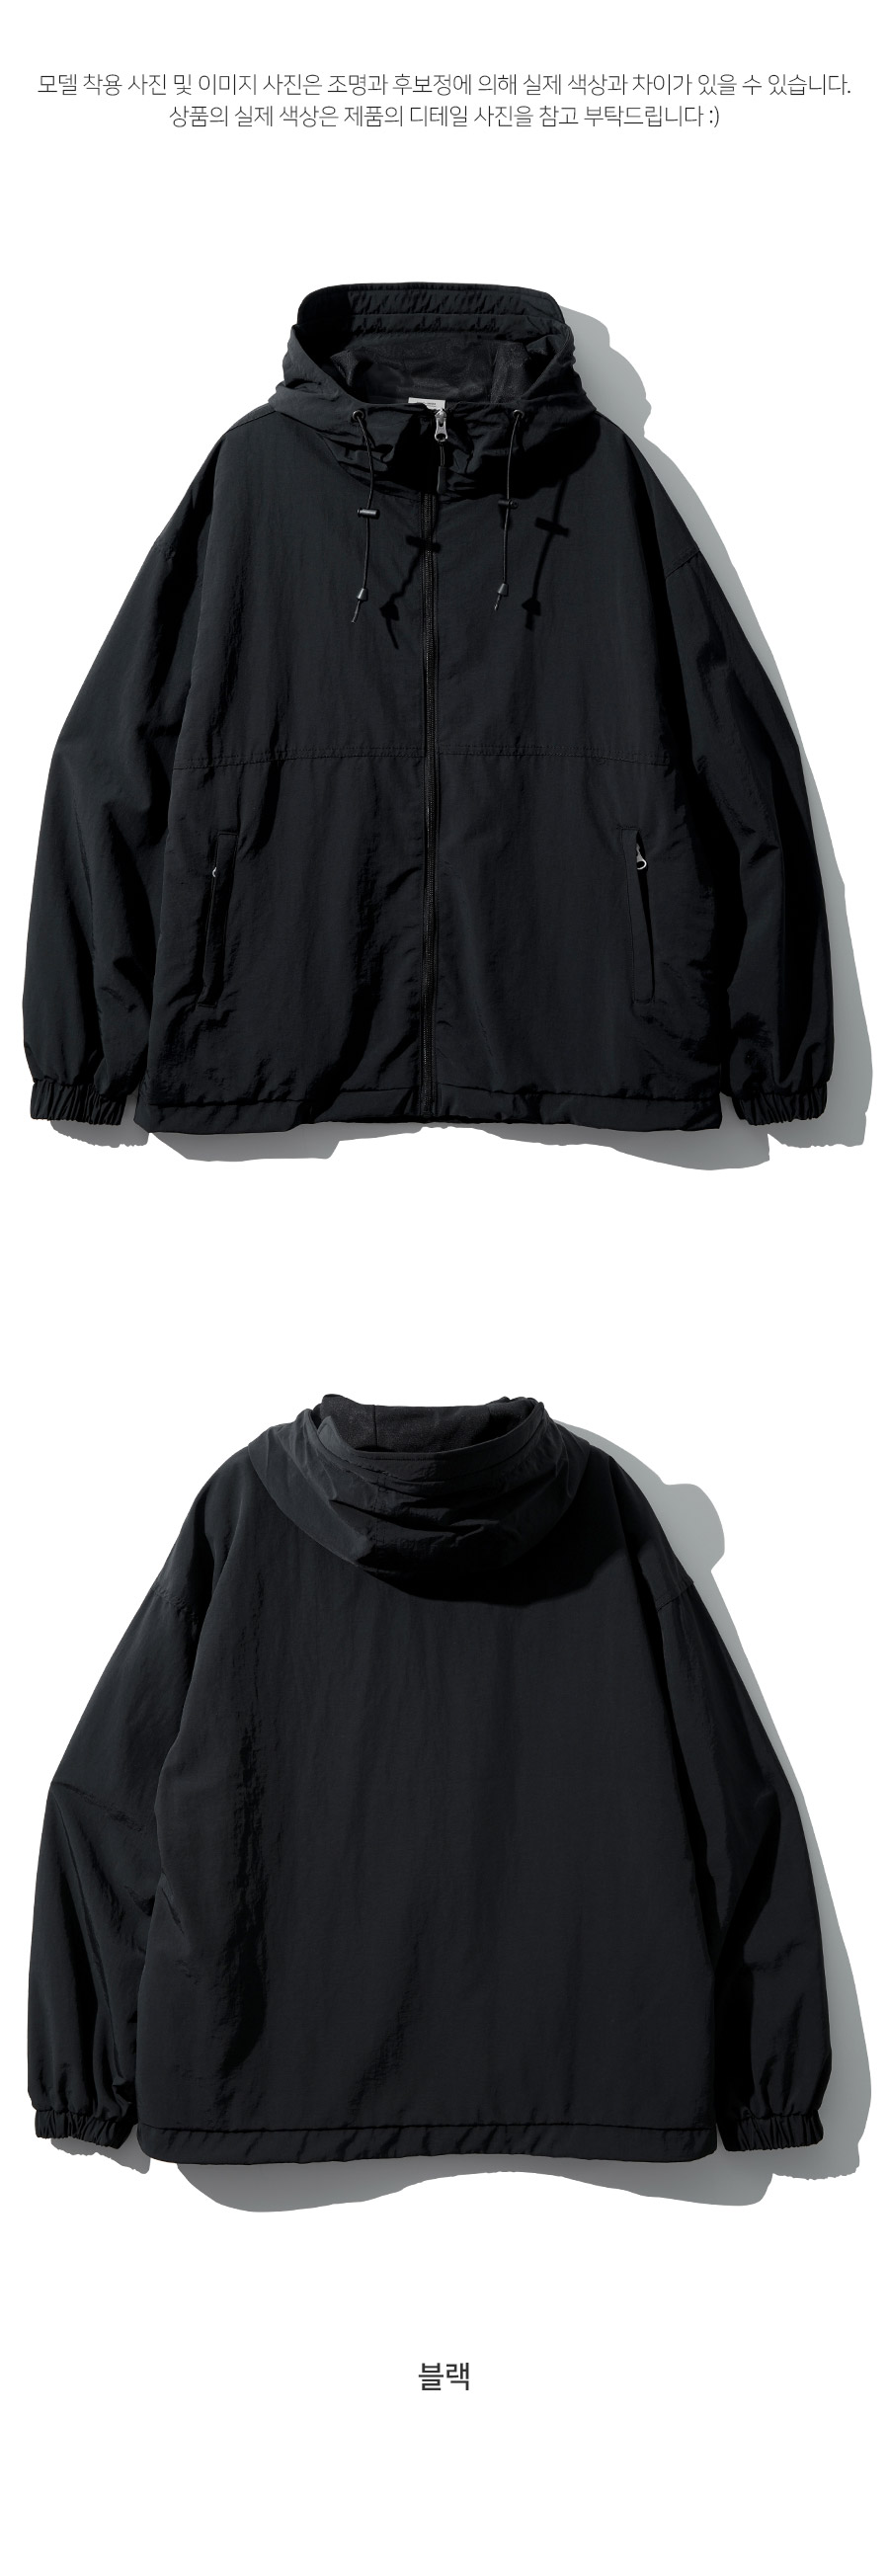 5_JHOT1276_detail_black1_hj.jpg